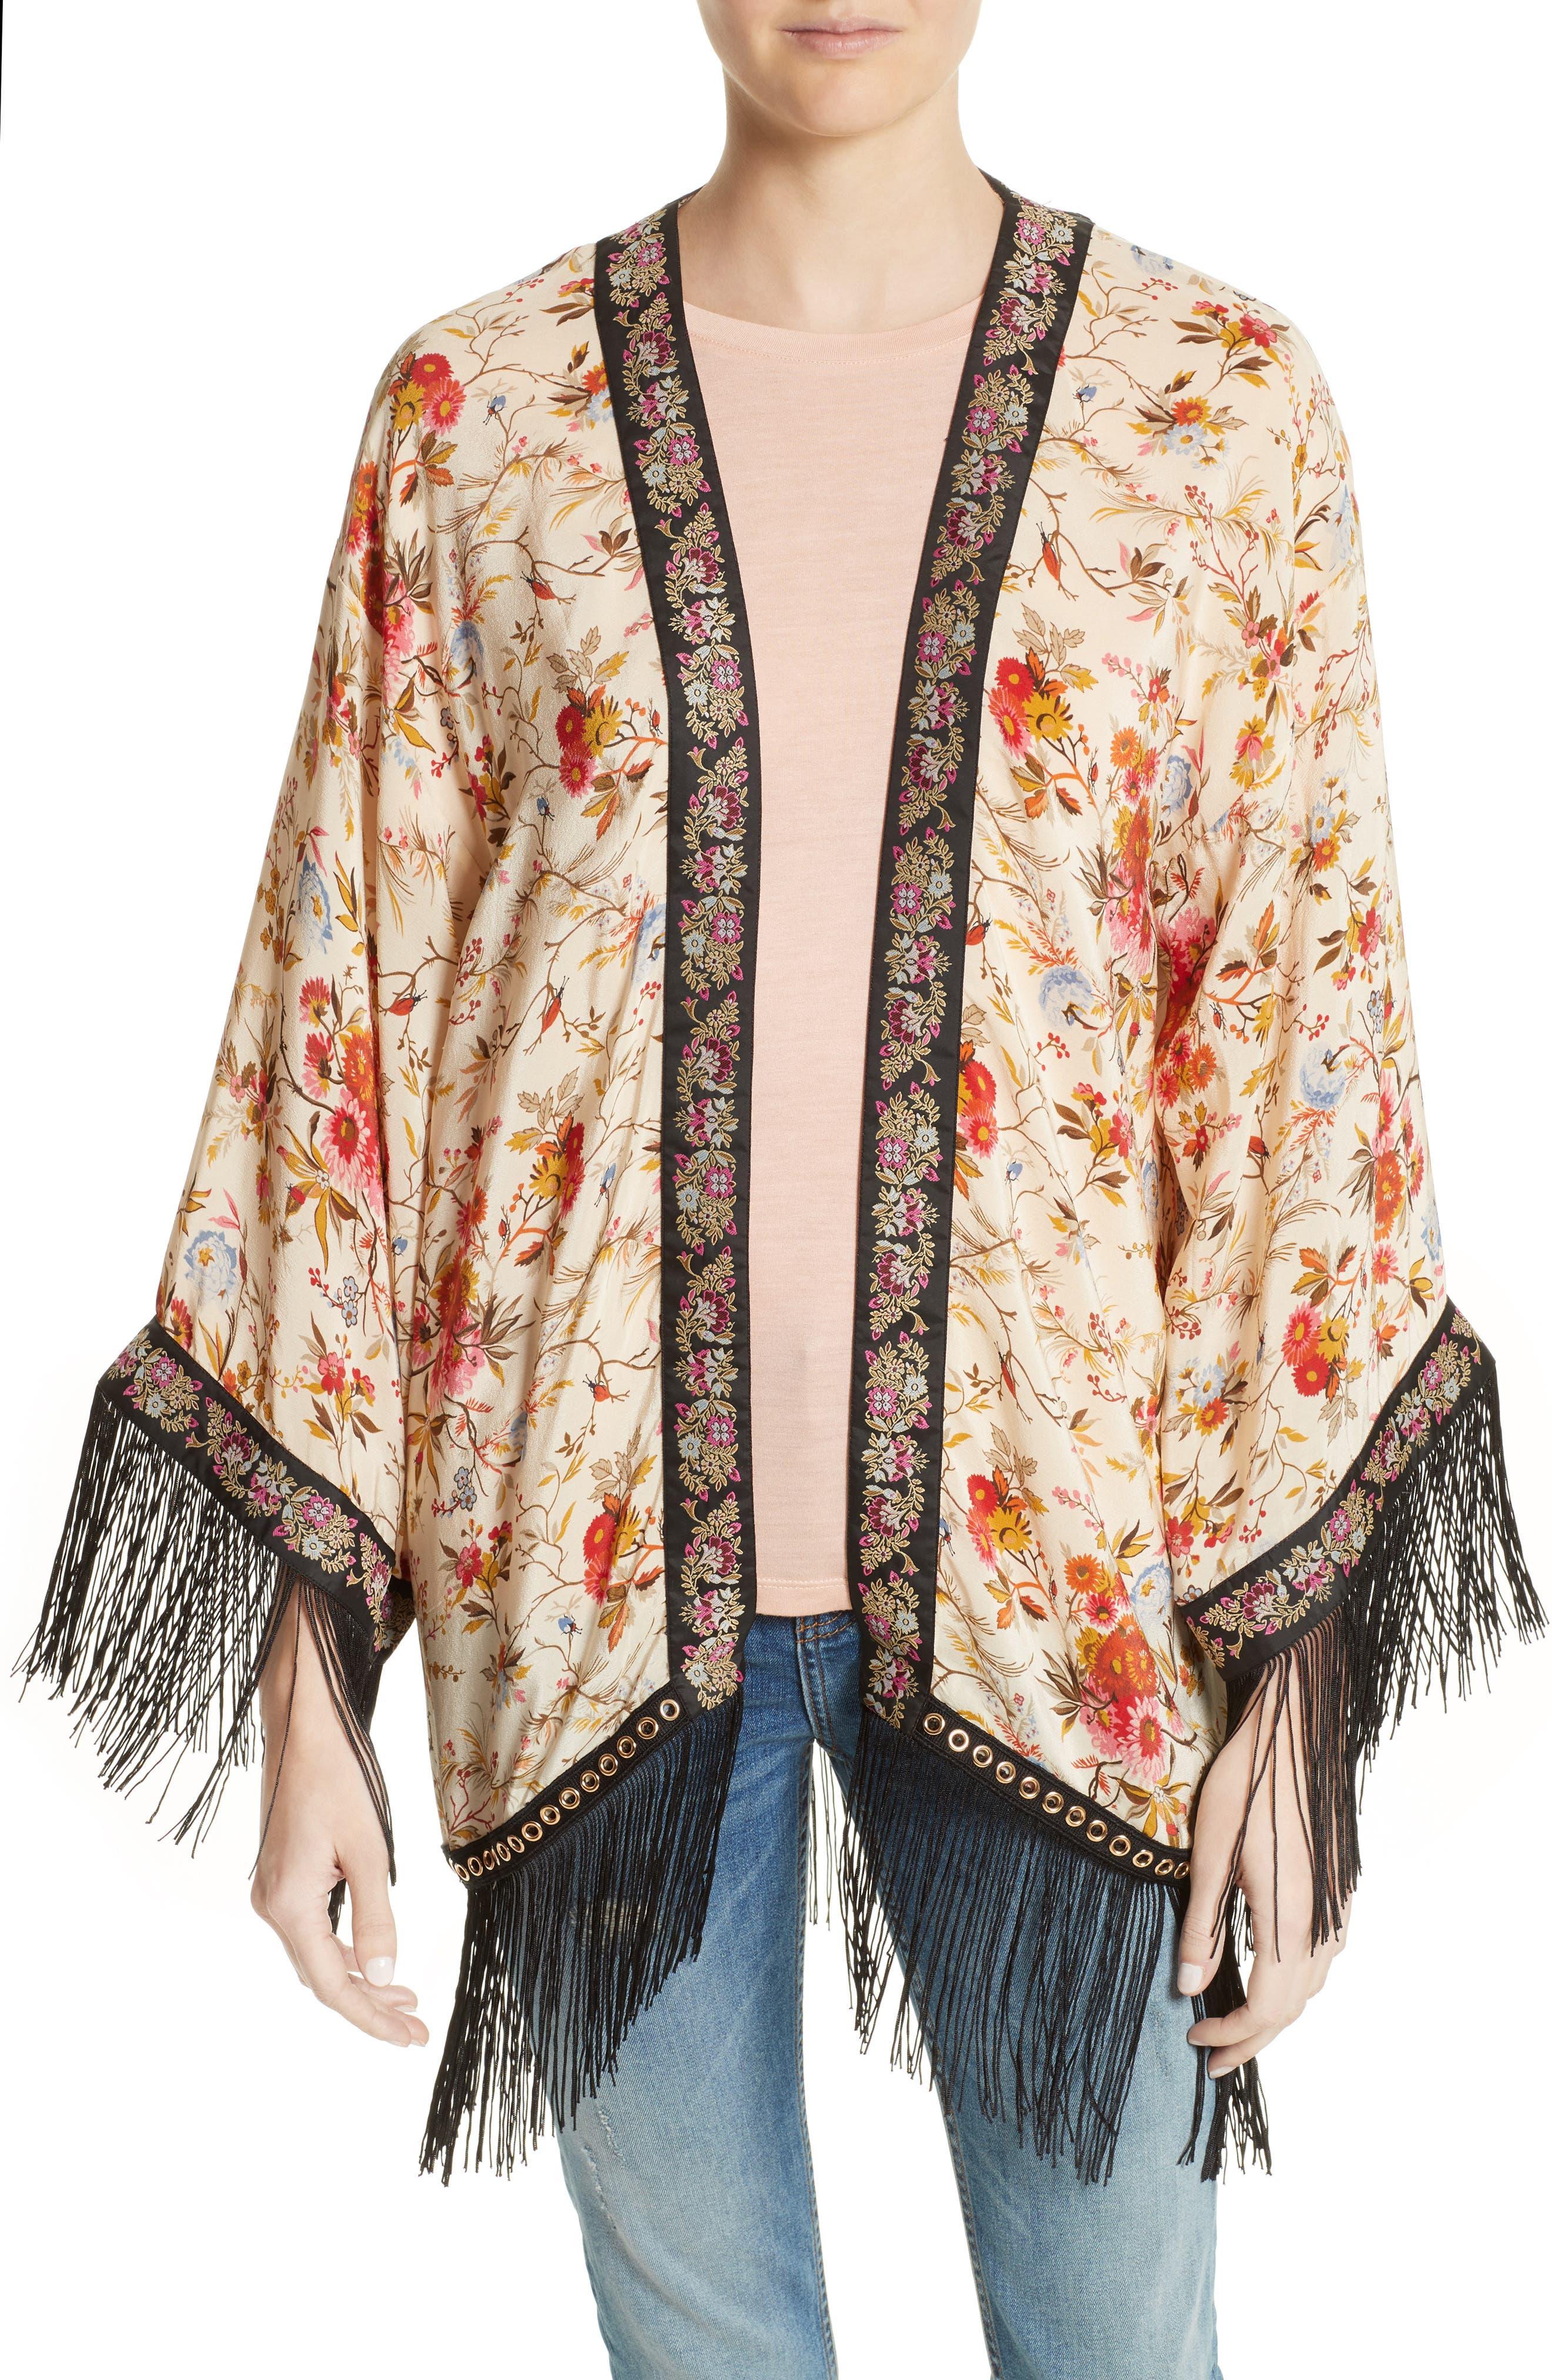 Main Image - The Kooples Fleurs D'Artifice Floral Print Fringe Kimono